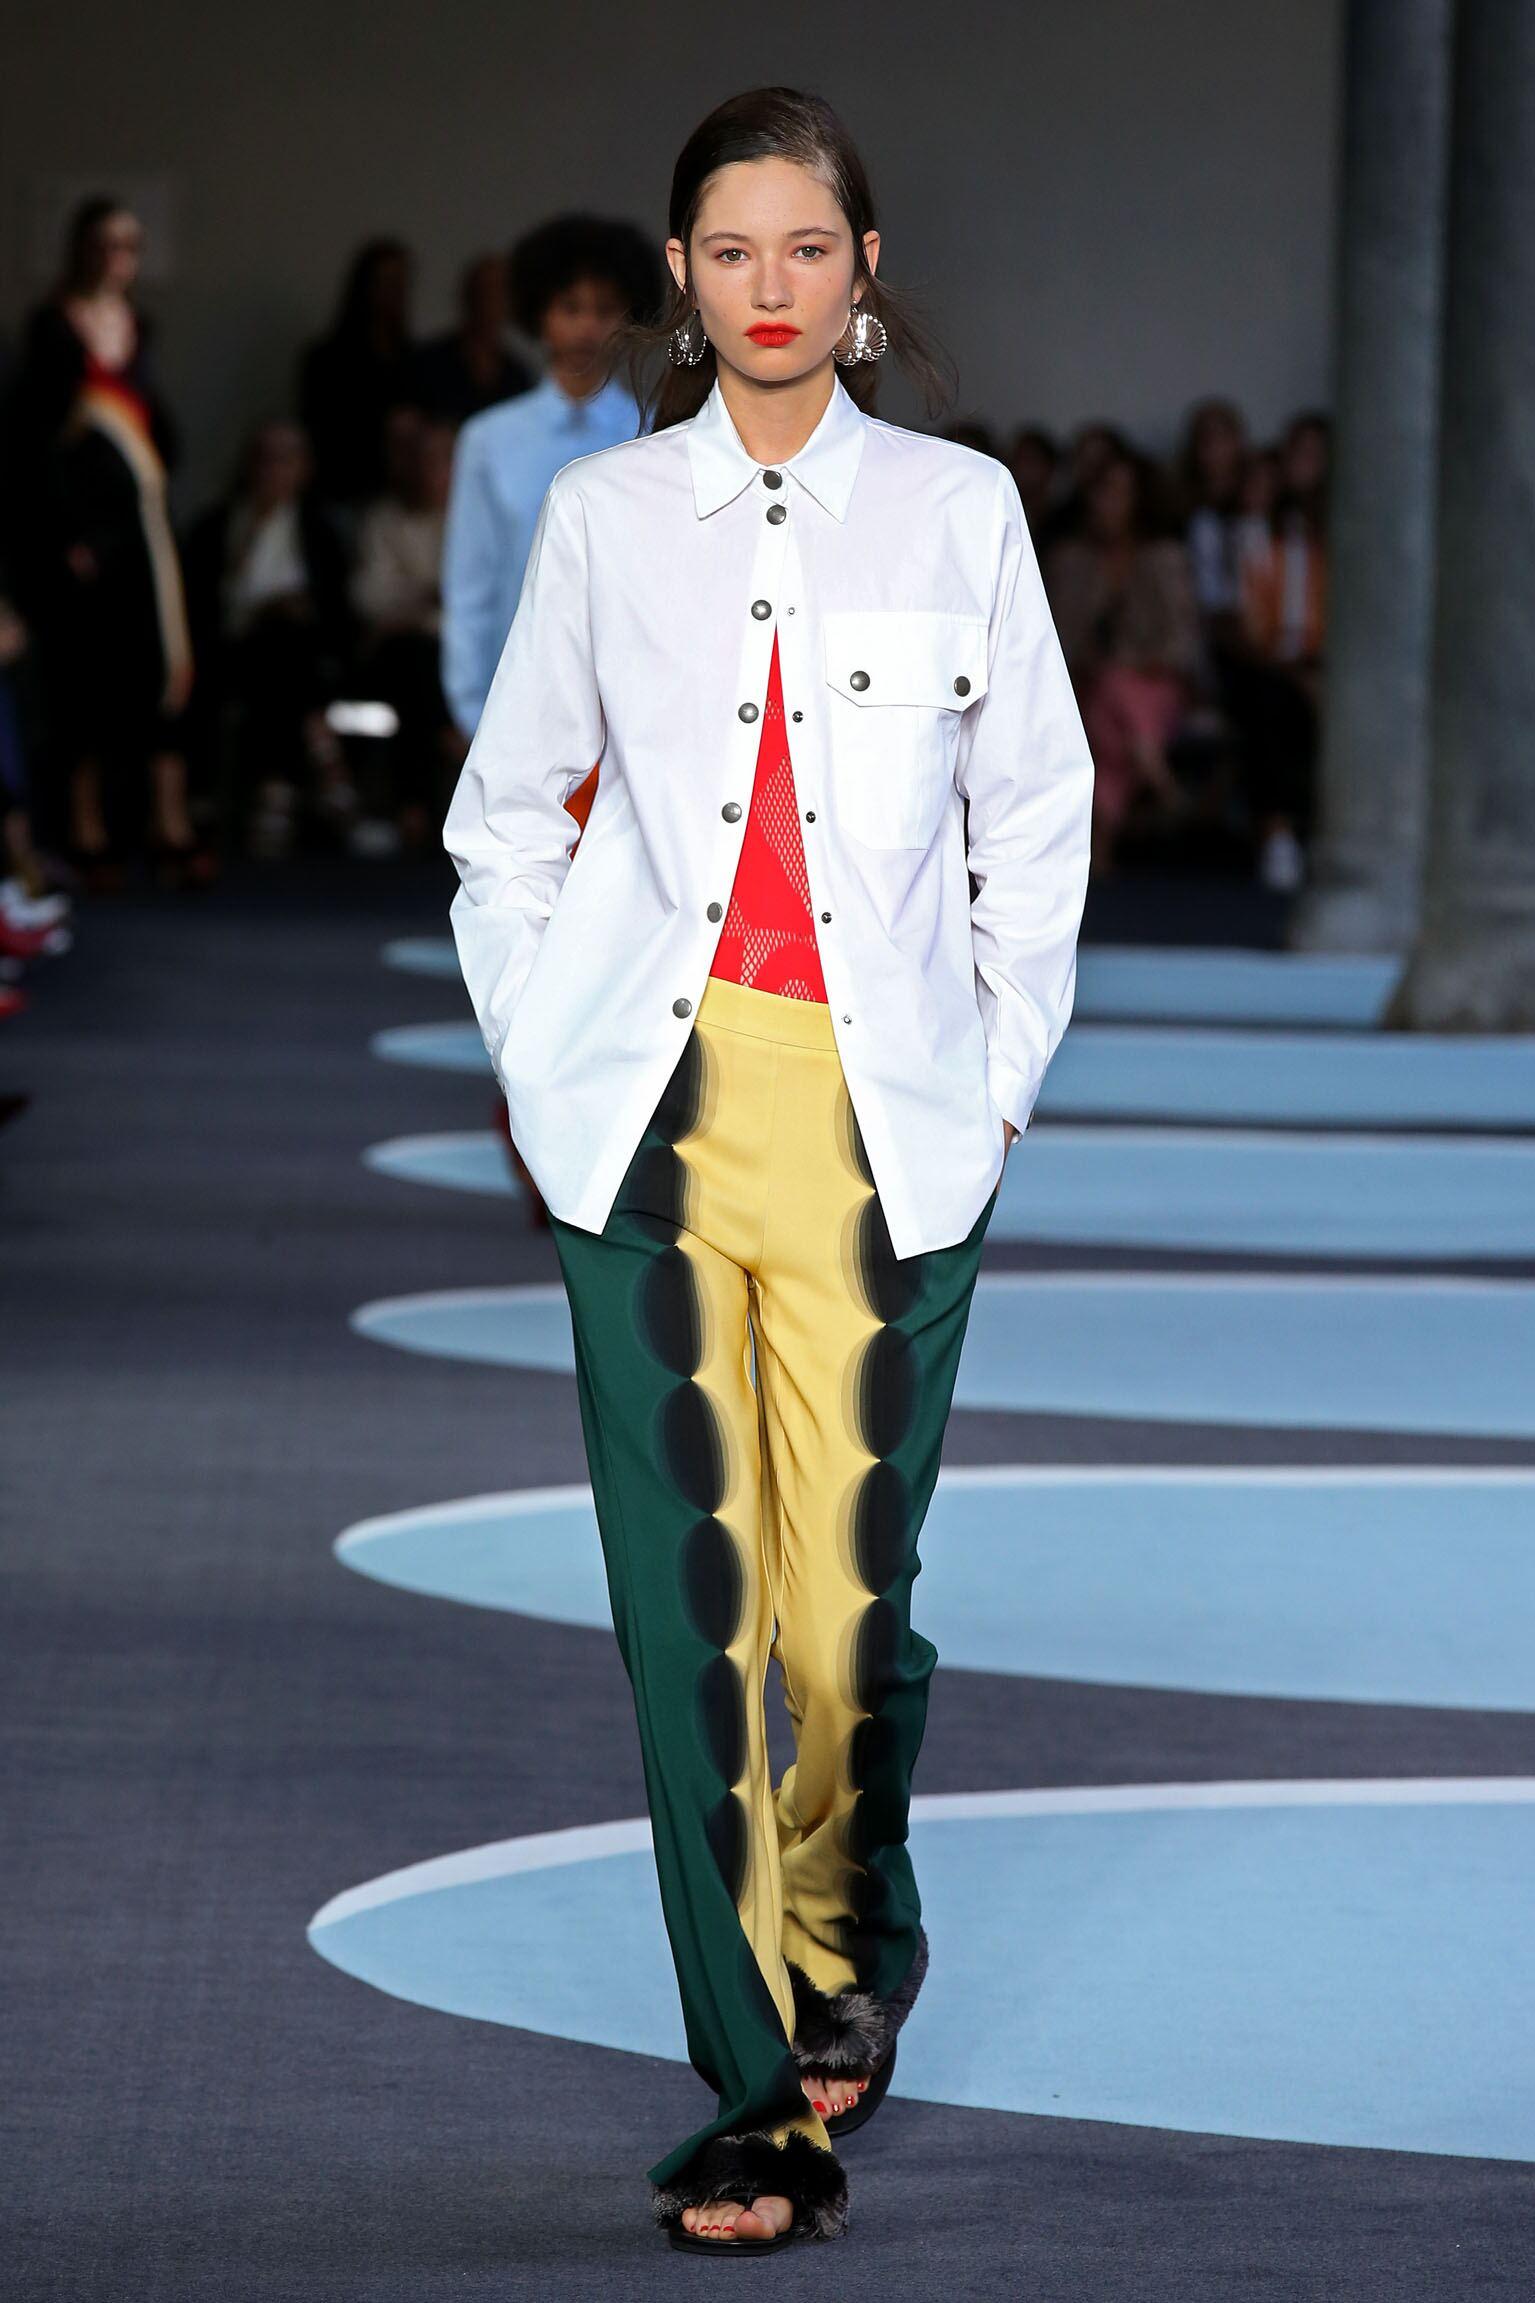 Summer 2018 Fashion Trends Marco De Vincenzo